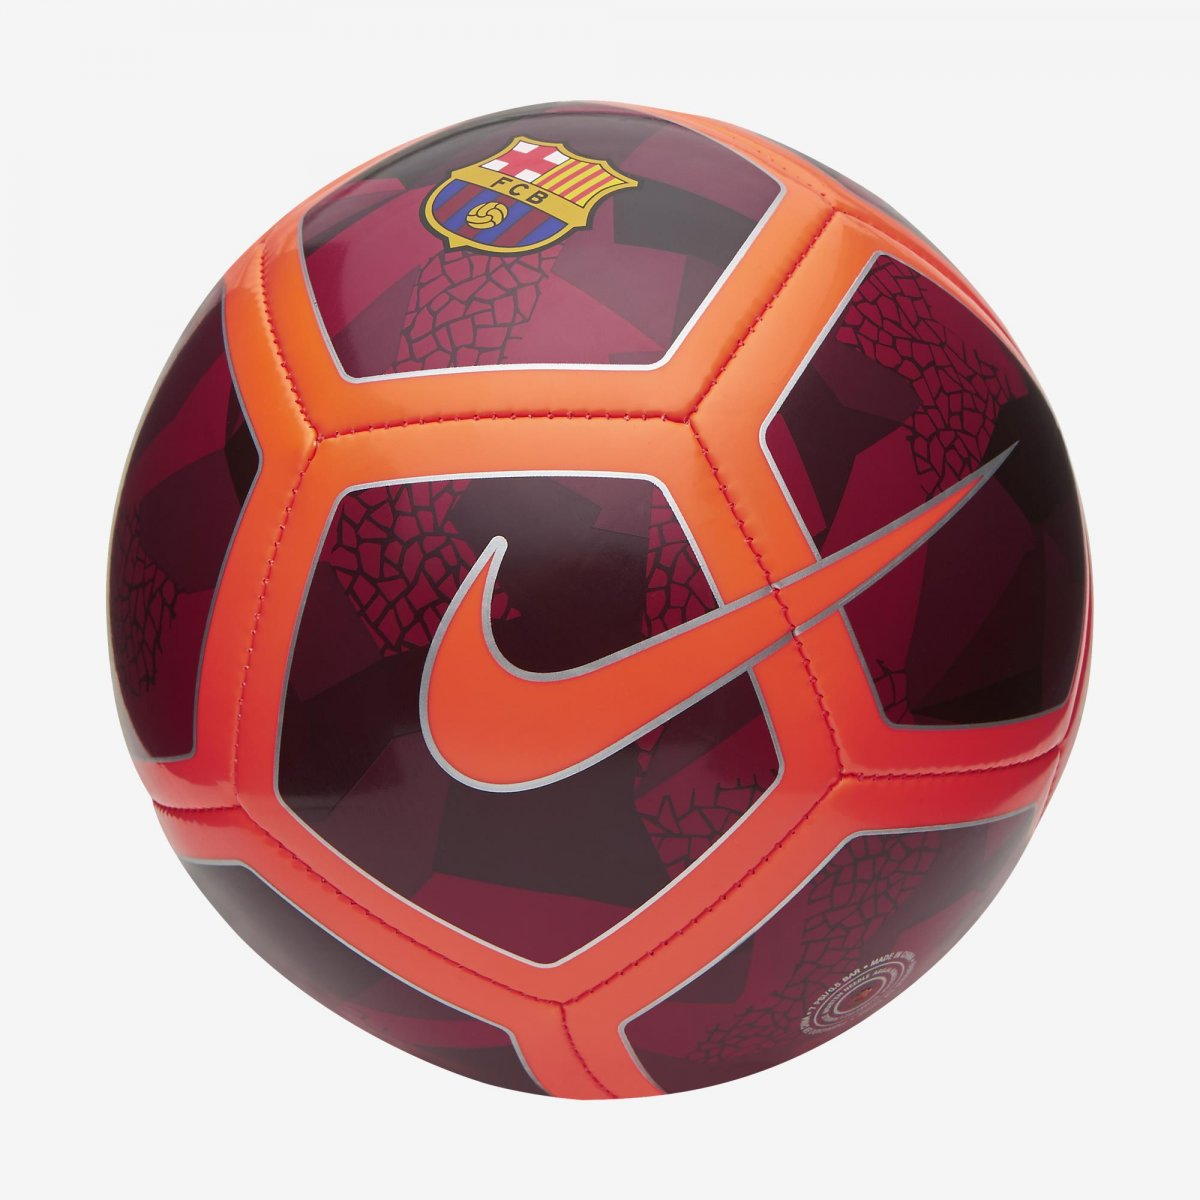 Bizz Store - Mini Bola Futebol De Campo Nike Barcelona Skills d61f41af2177c